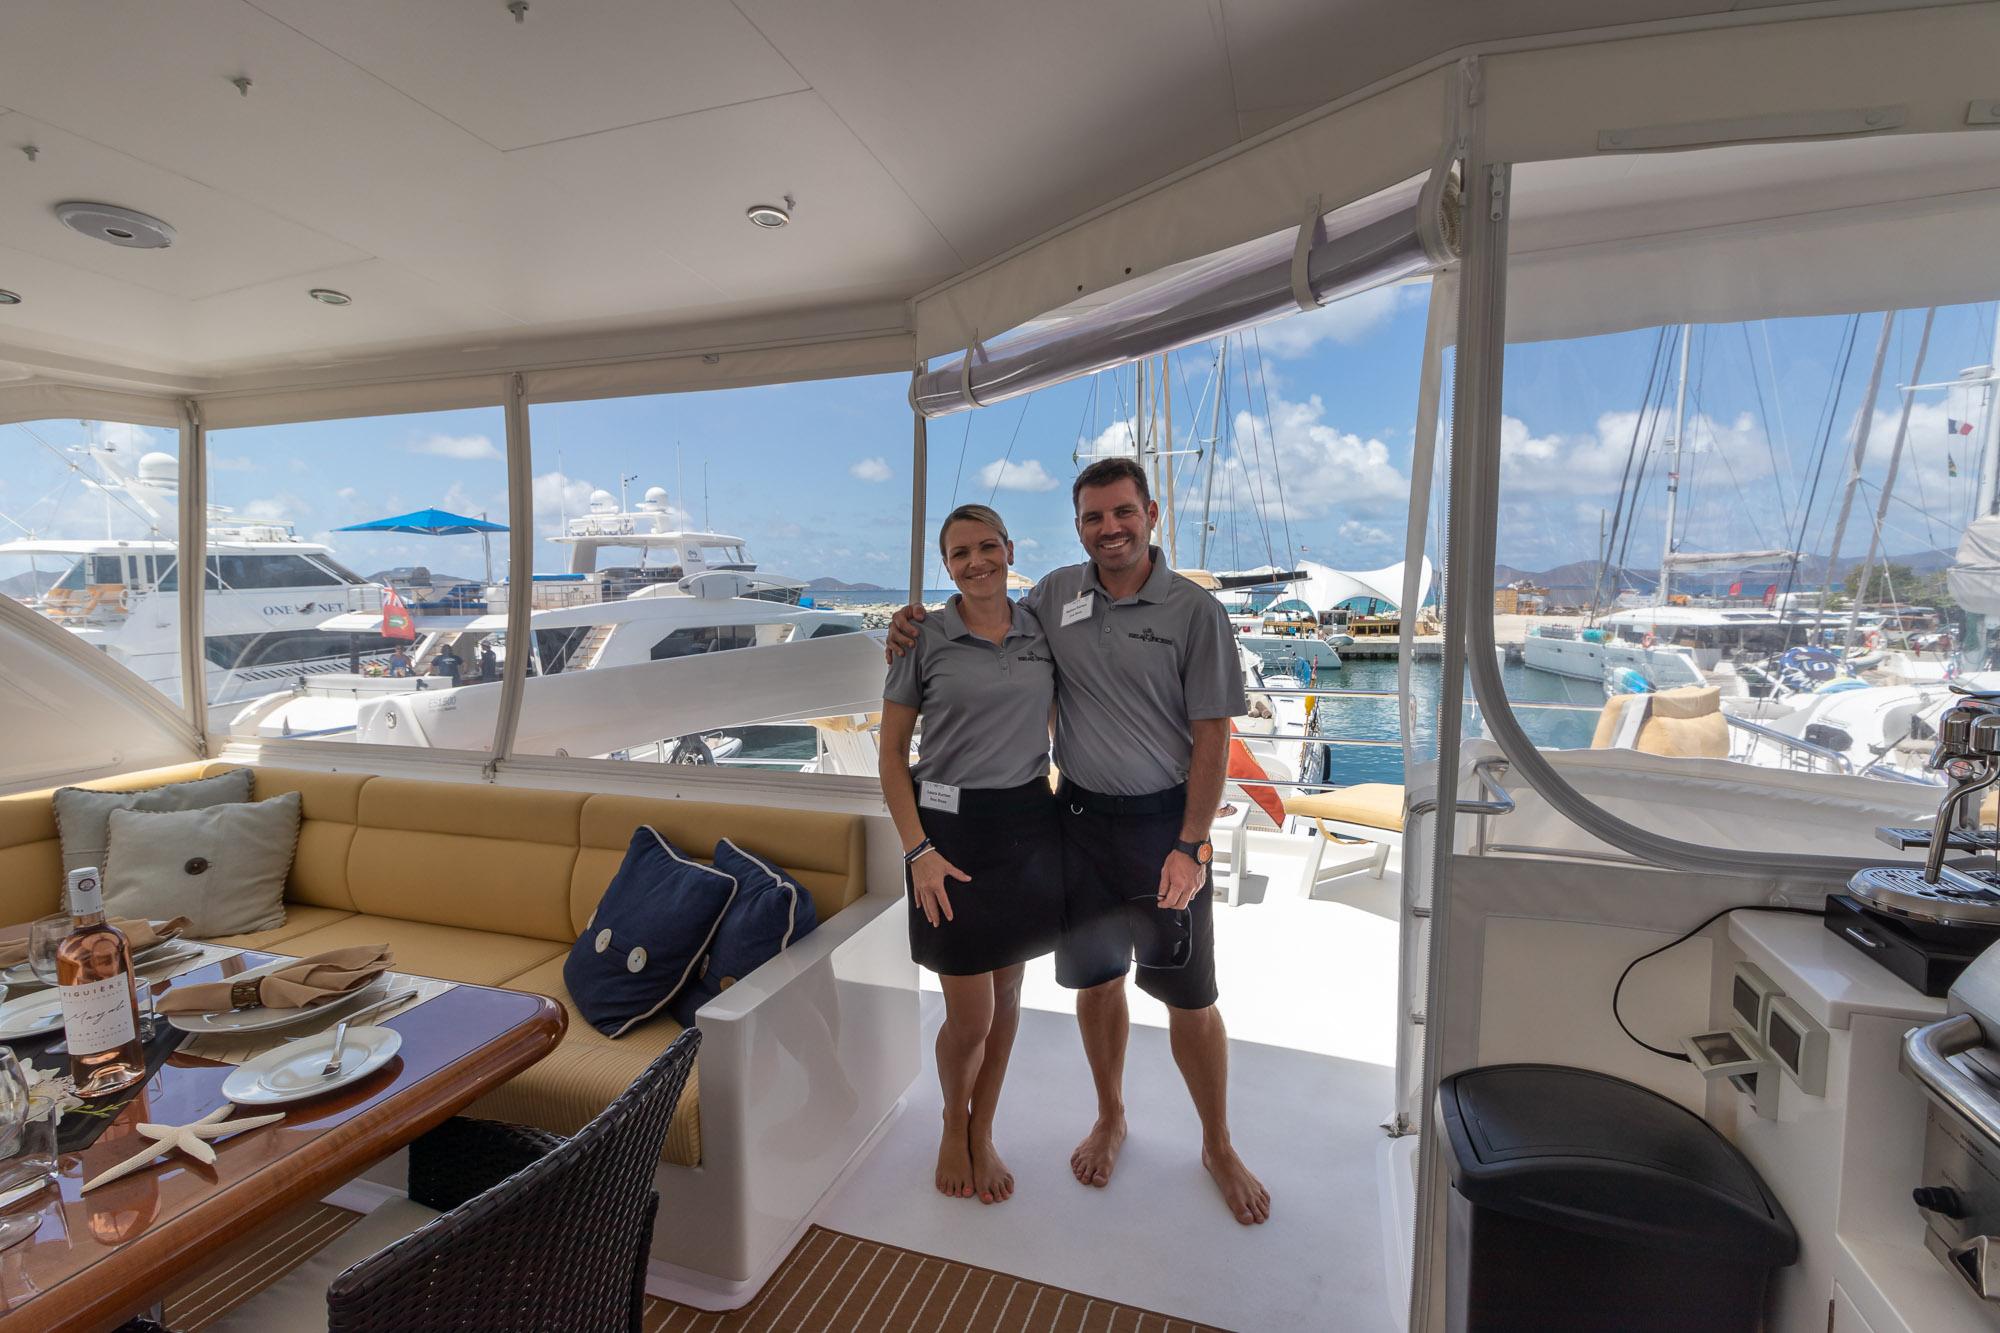 Sea Boss Charter Yacht (11 of 16).jpg